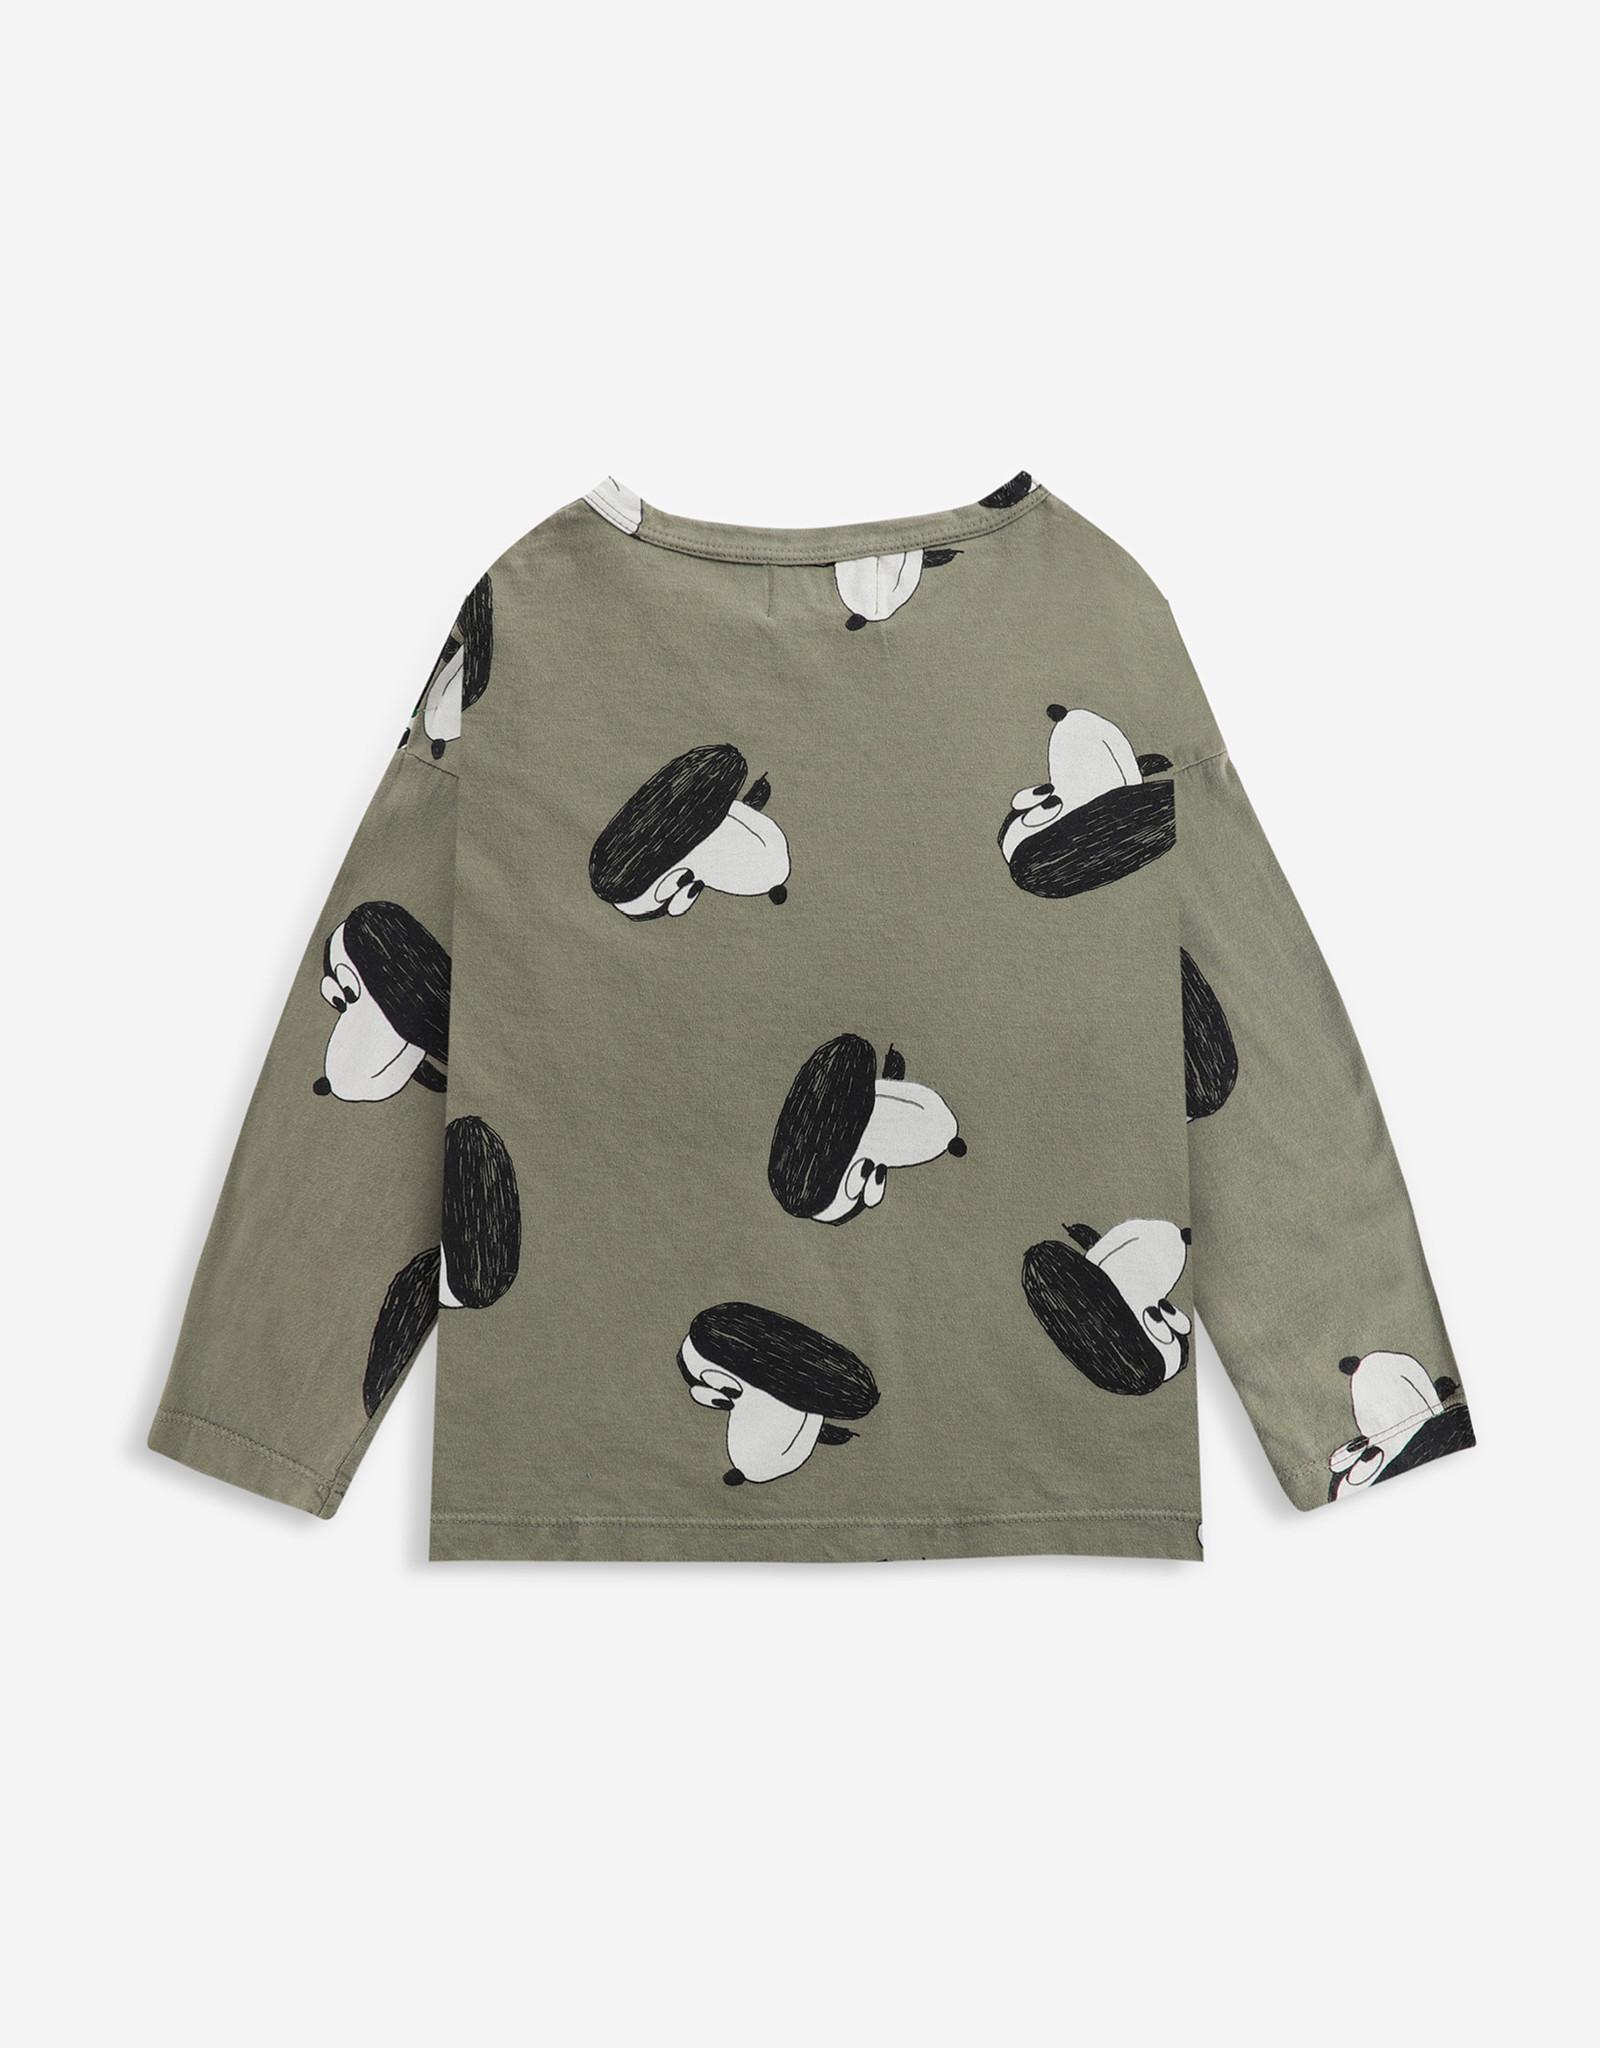 Bobo Choses Doggie All Over long sleeve T-shirt